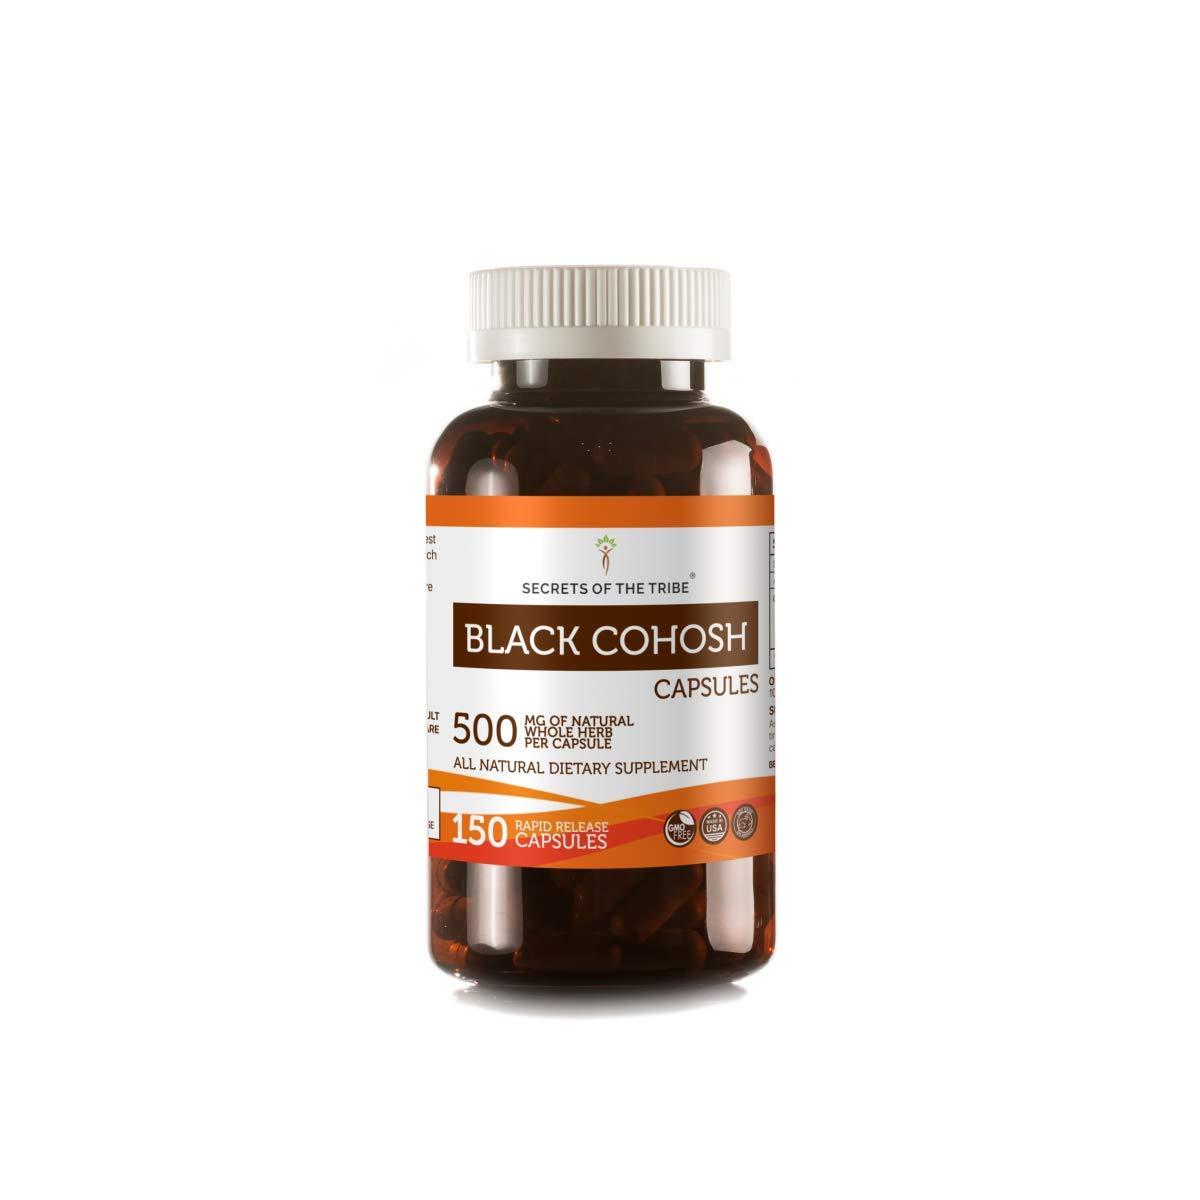 Black Cohosh 150 Capsules, 500 mg, Organic Black Cohosh (Cimicifuga Racemosa) Dried Root (150 Capsules)